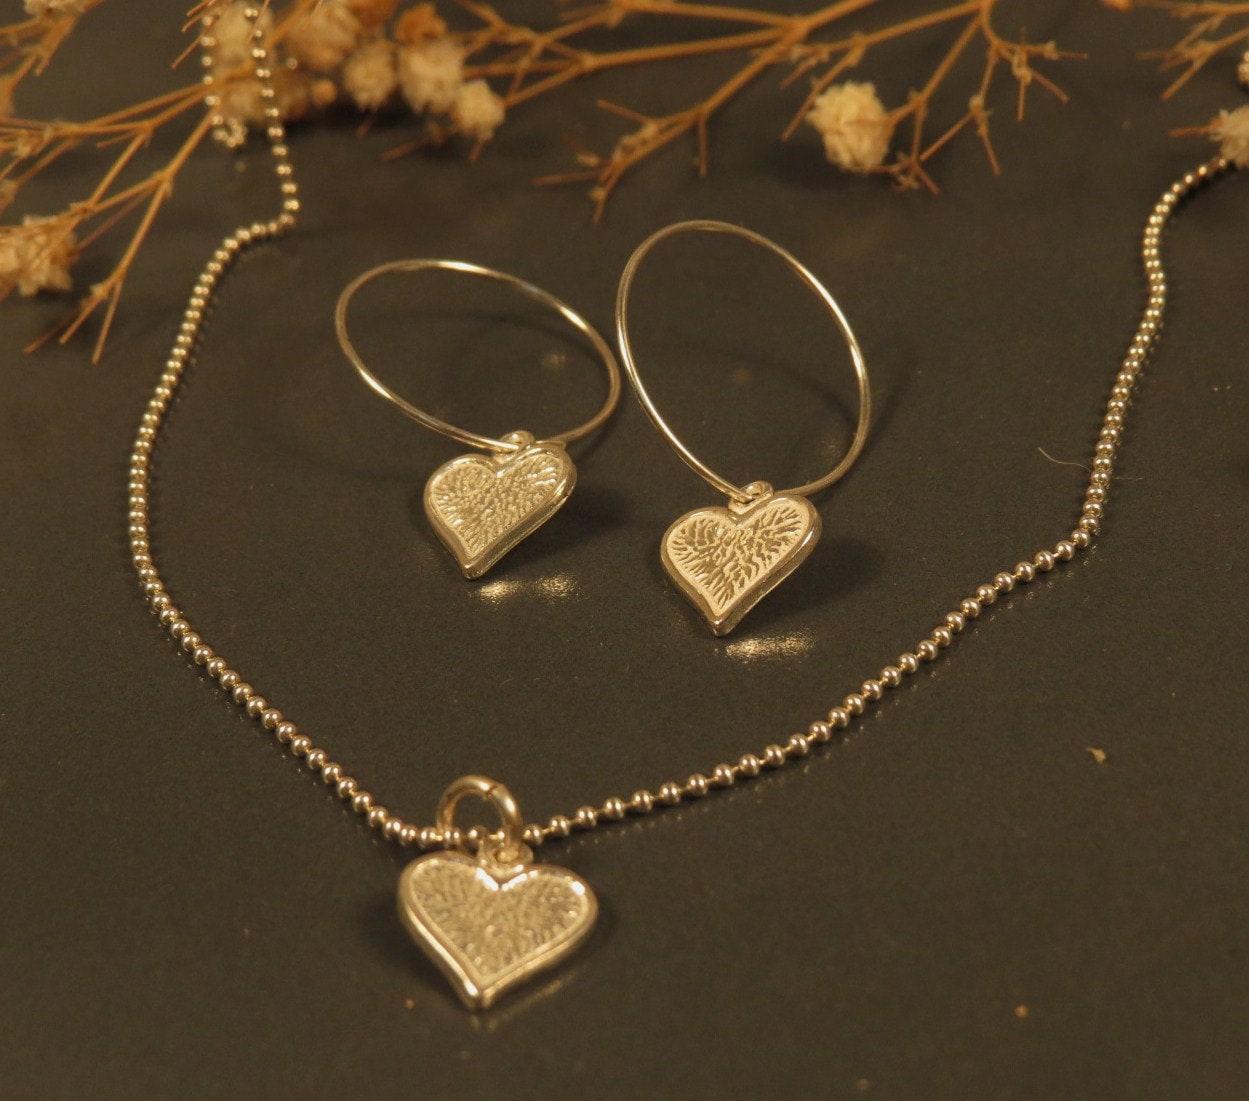 Heart hoop earrings, Silver heart earrings, Dainty heart hoops for Valentine gift or Birthday gift sister, best friend, mom